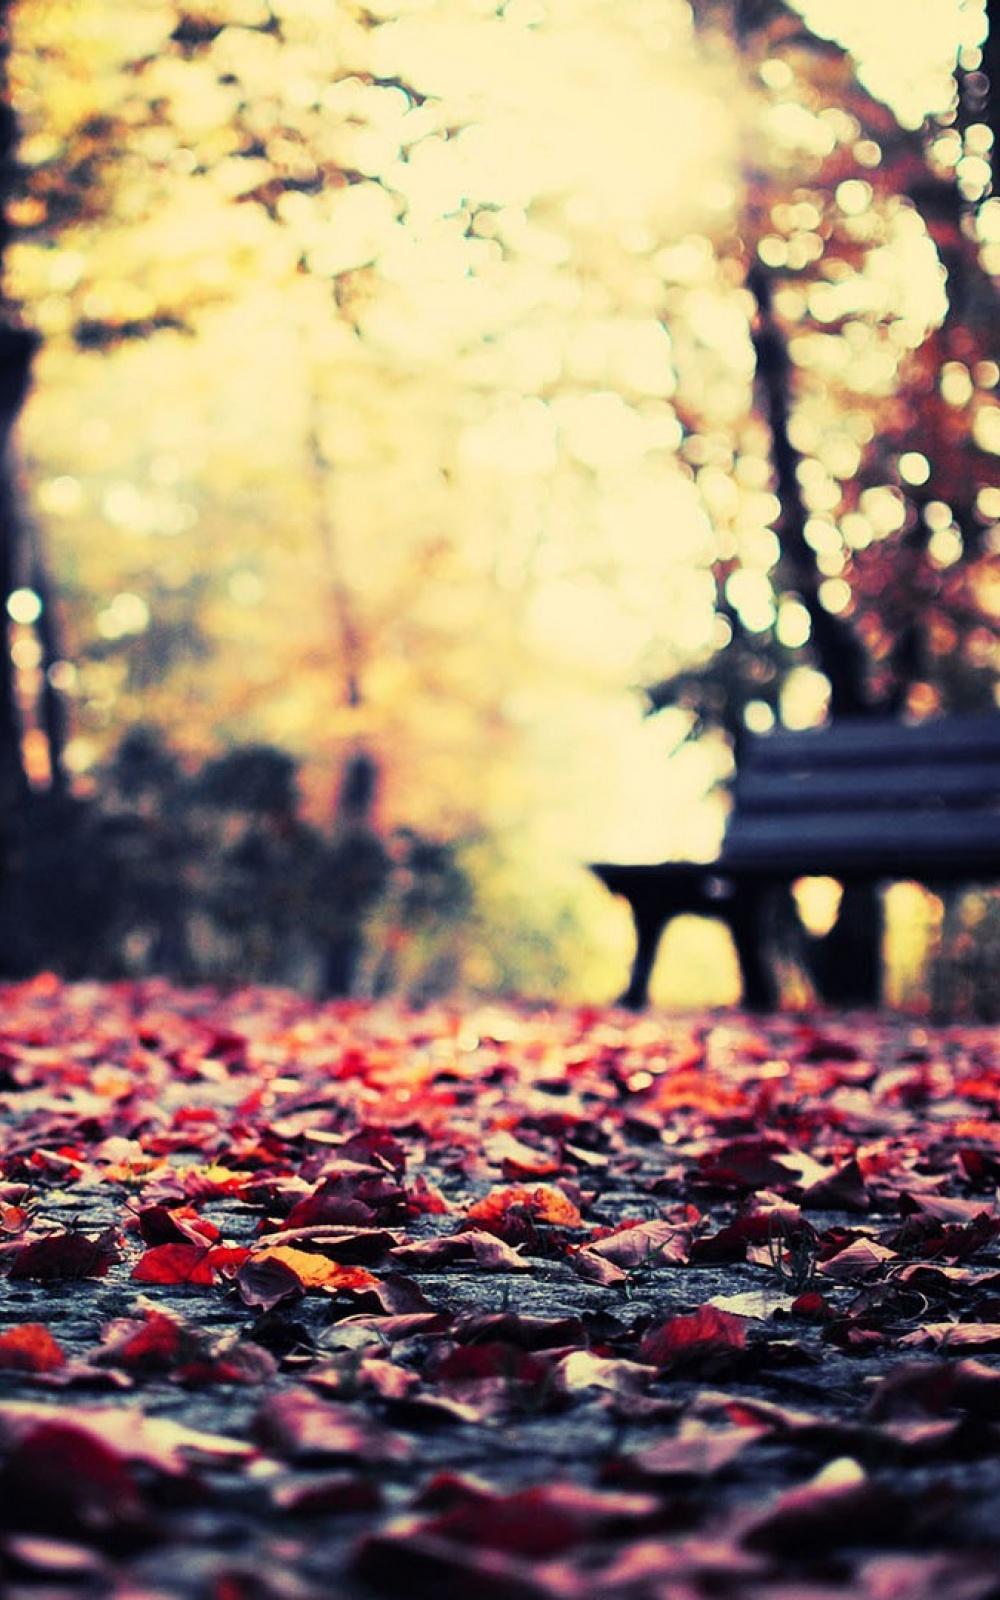 Autumn Leaves Park Bench iPhone 6 Plus HD Wallpaper iPod Wallpaper 1000x1600